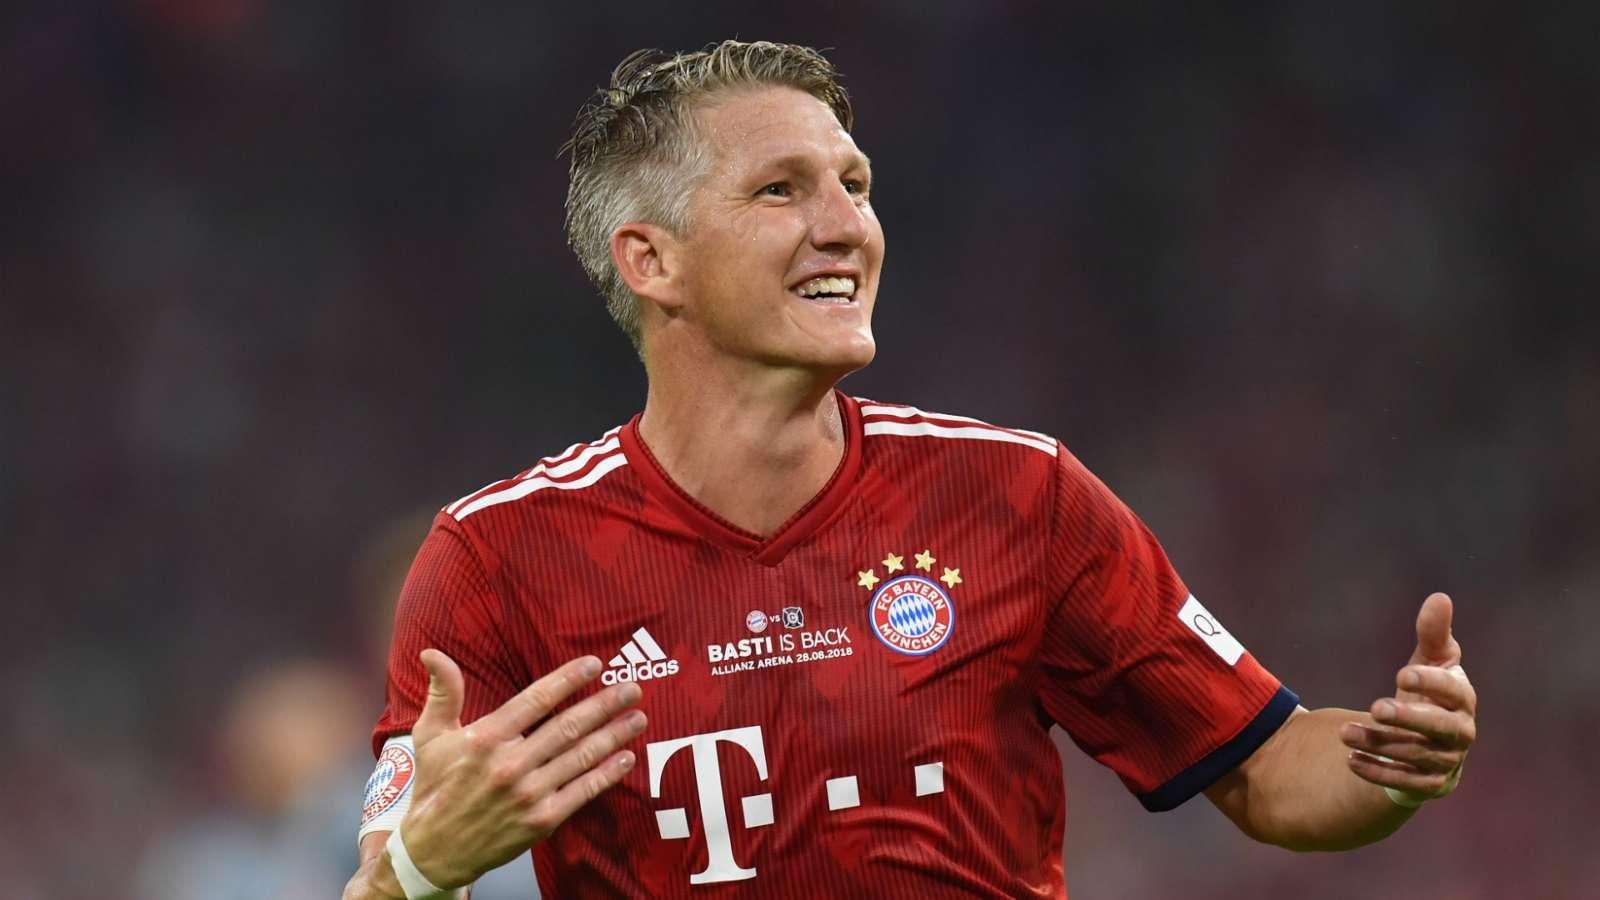 بایرن مونیخ / آلمان / بوندسلیگا / Germany / Bundesliga/ Bayern Munchen